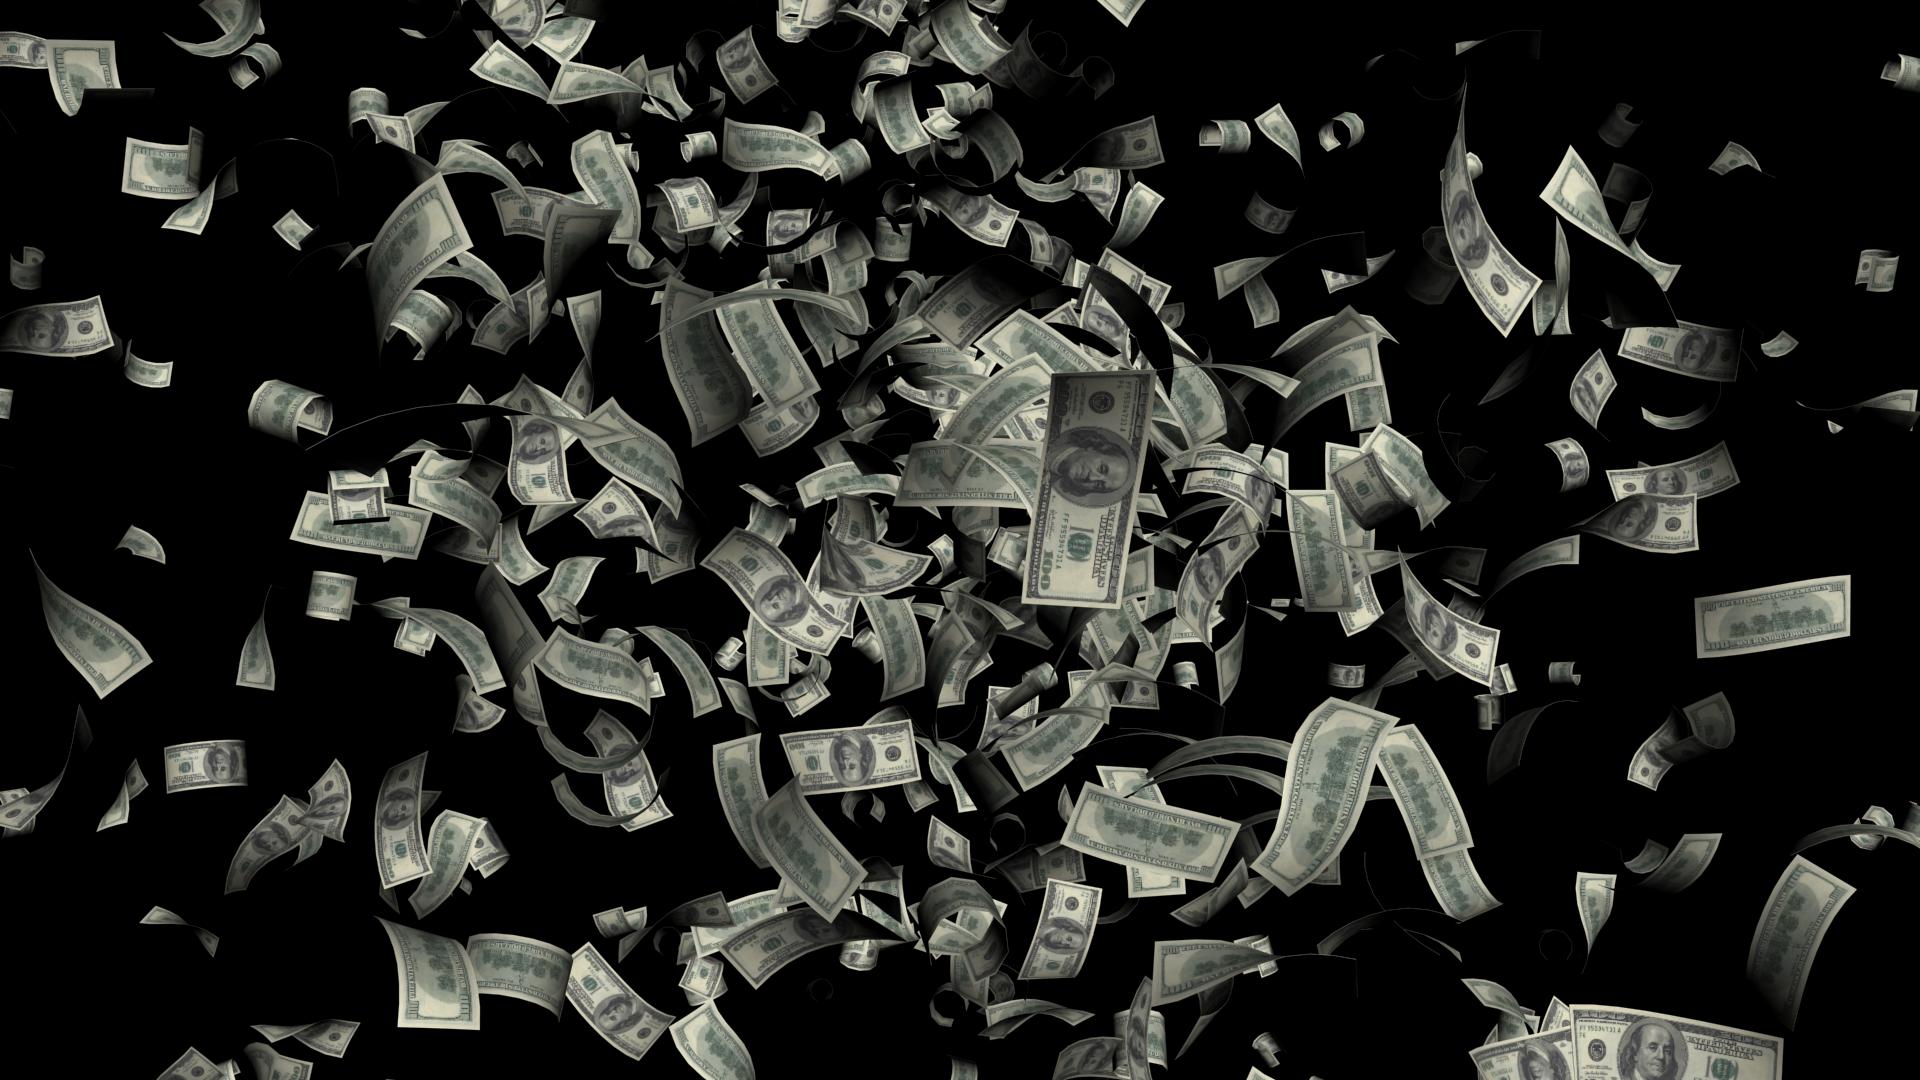 Money raining png. Hd transparent images pluspng